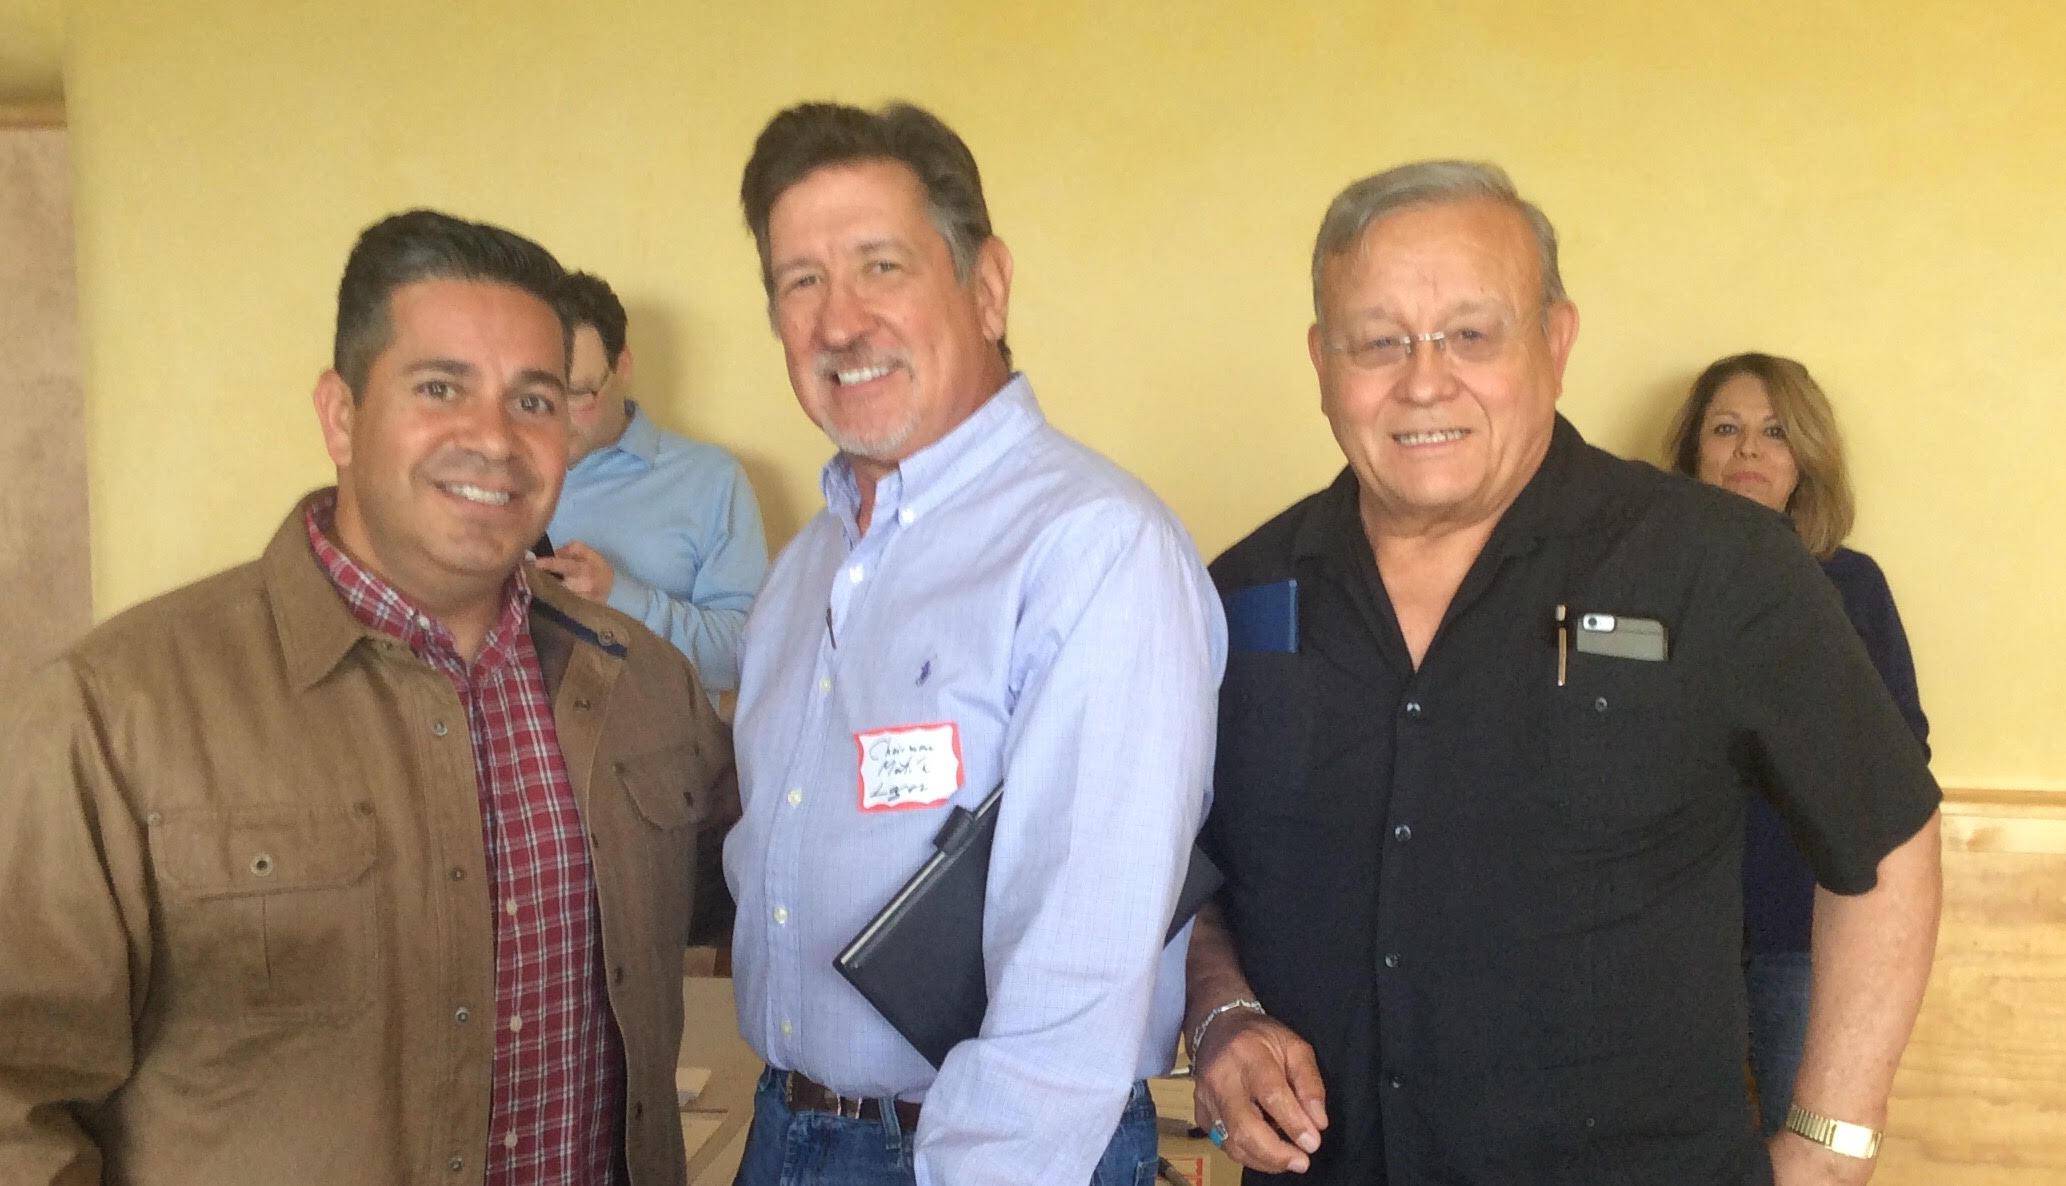 Congressman Ben Ray Lujan, San Miguel County Democratic Party Chairman Martín Leger and State Representative Tomas Salazar